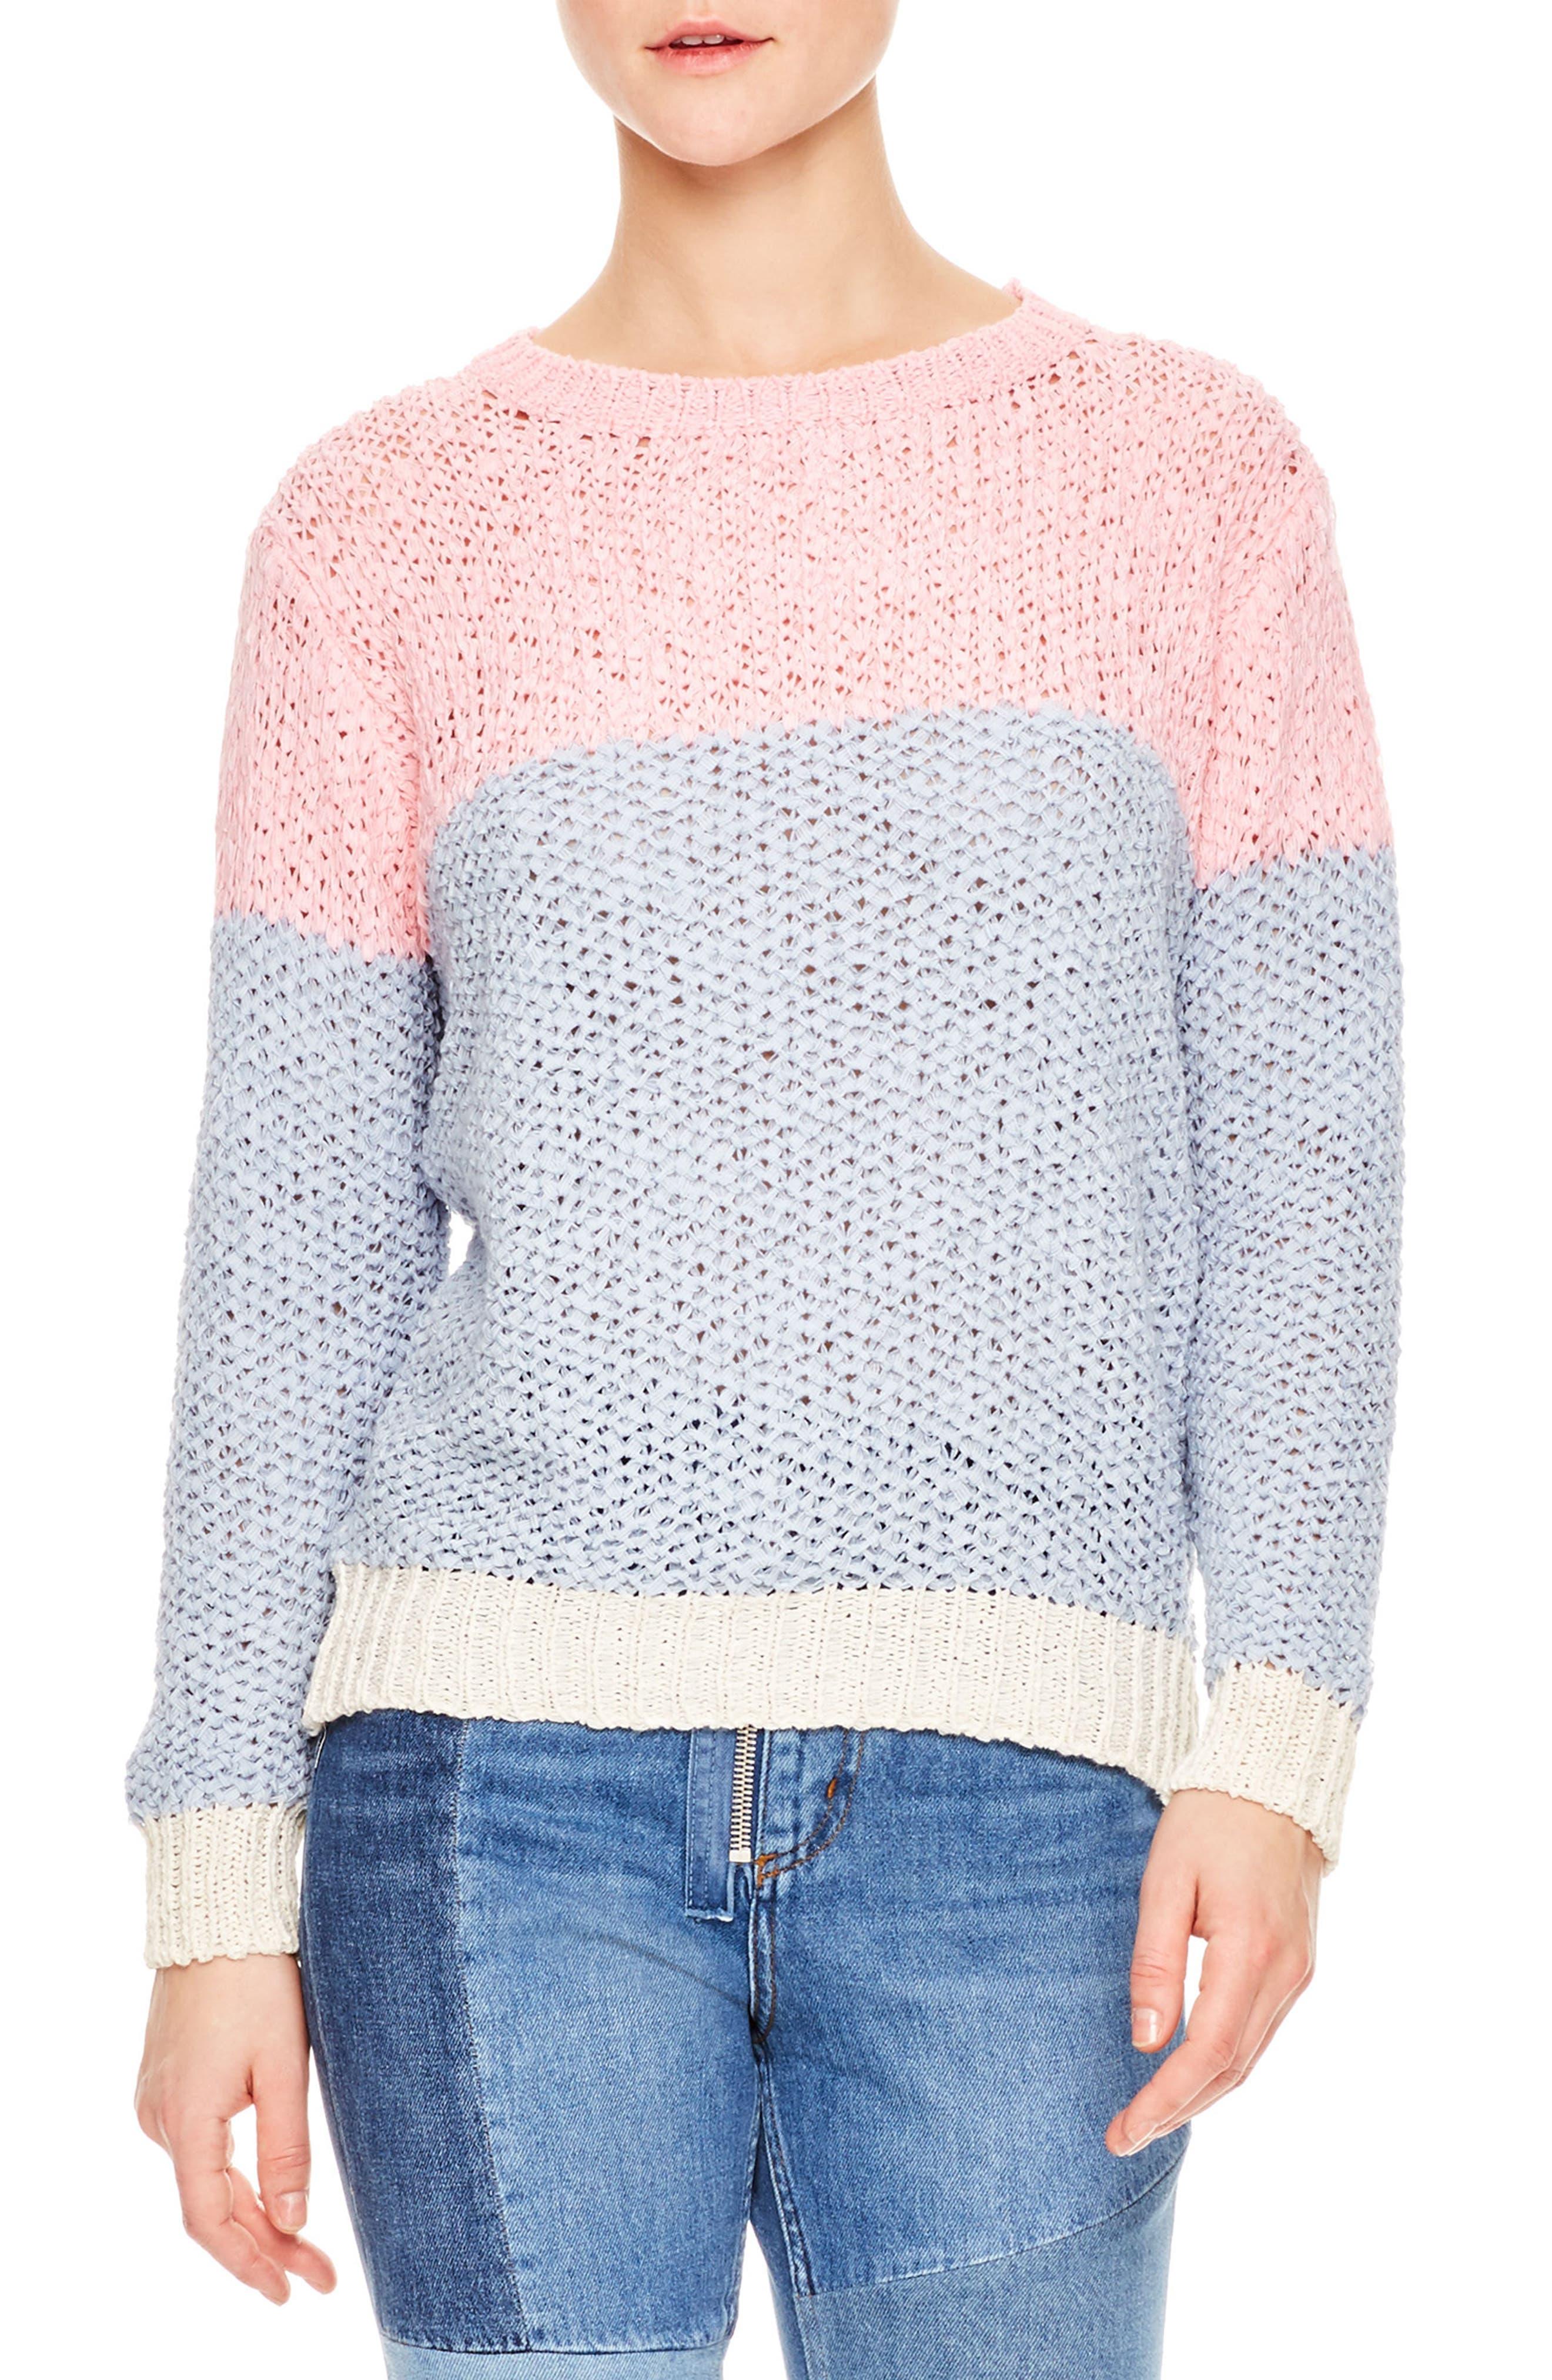 Malabar Colorblock Knit Sweater,                         Main,                         color, 650